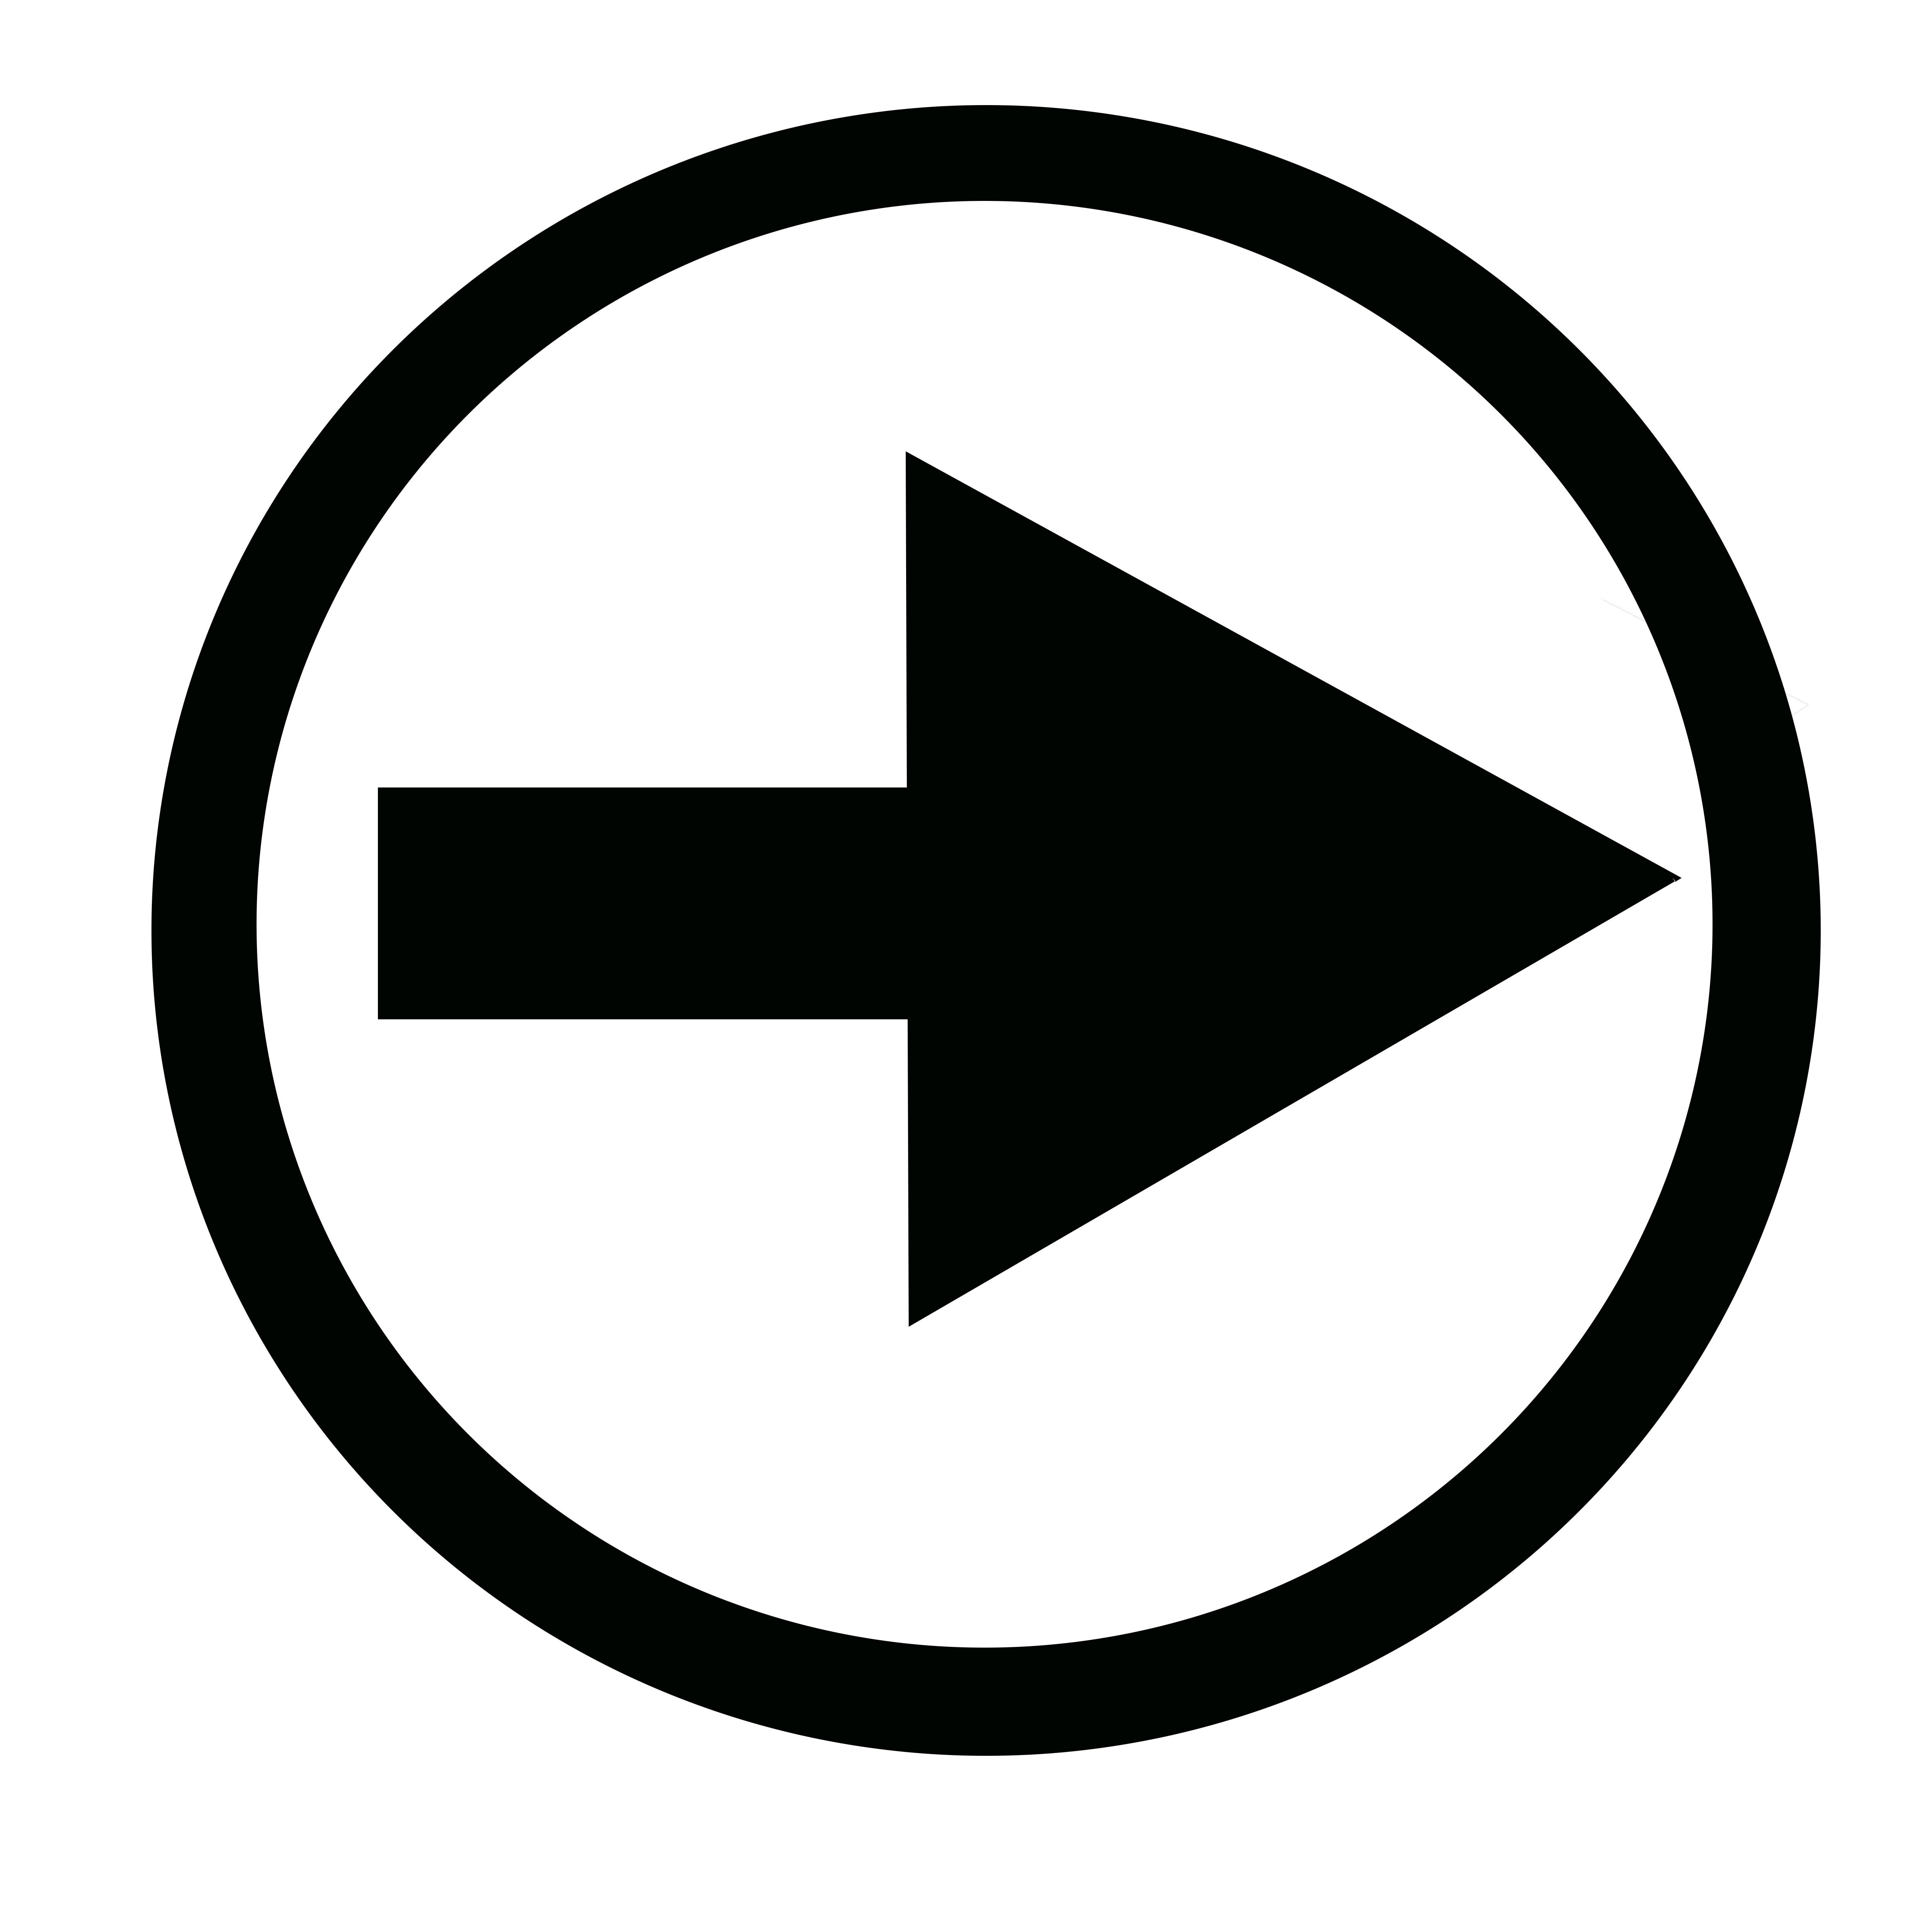 Arrow jpeg clipart transparent File:Right-facing-Arrow-icon.jpg - Wikimedia Commons clipart transparent